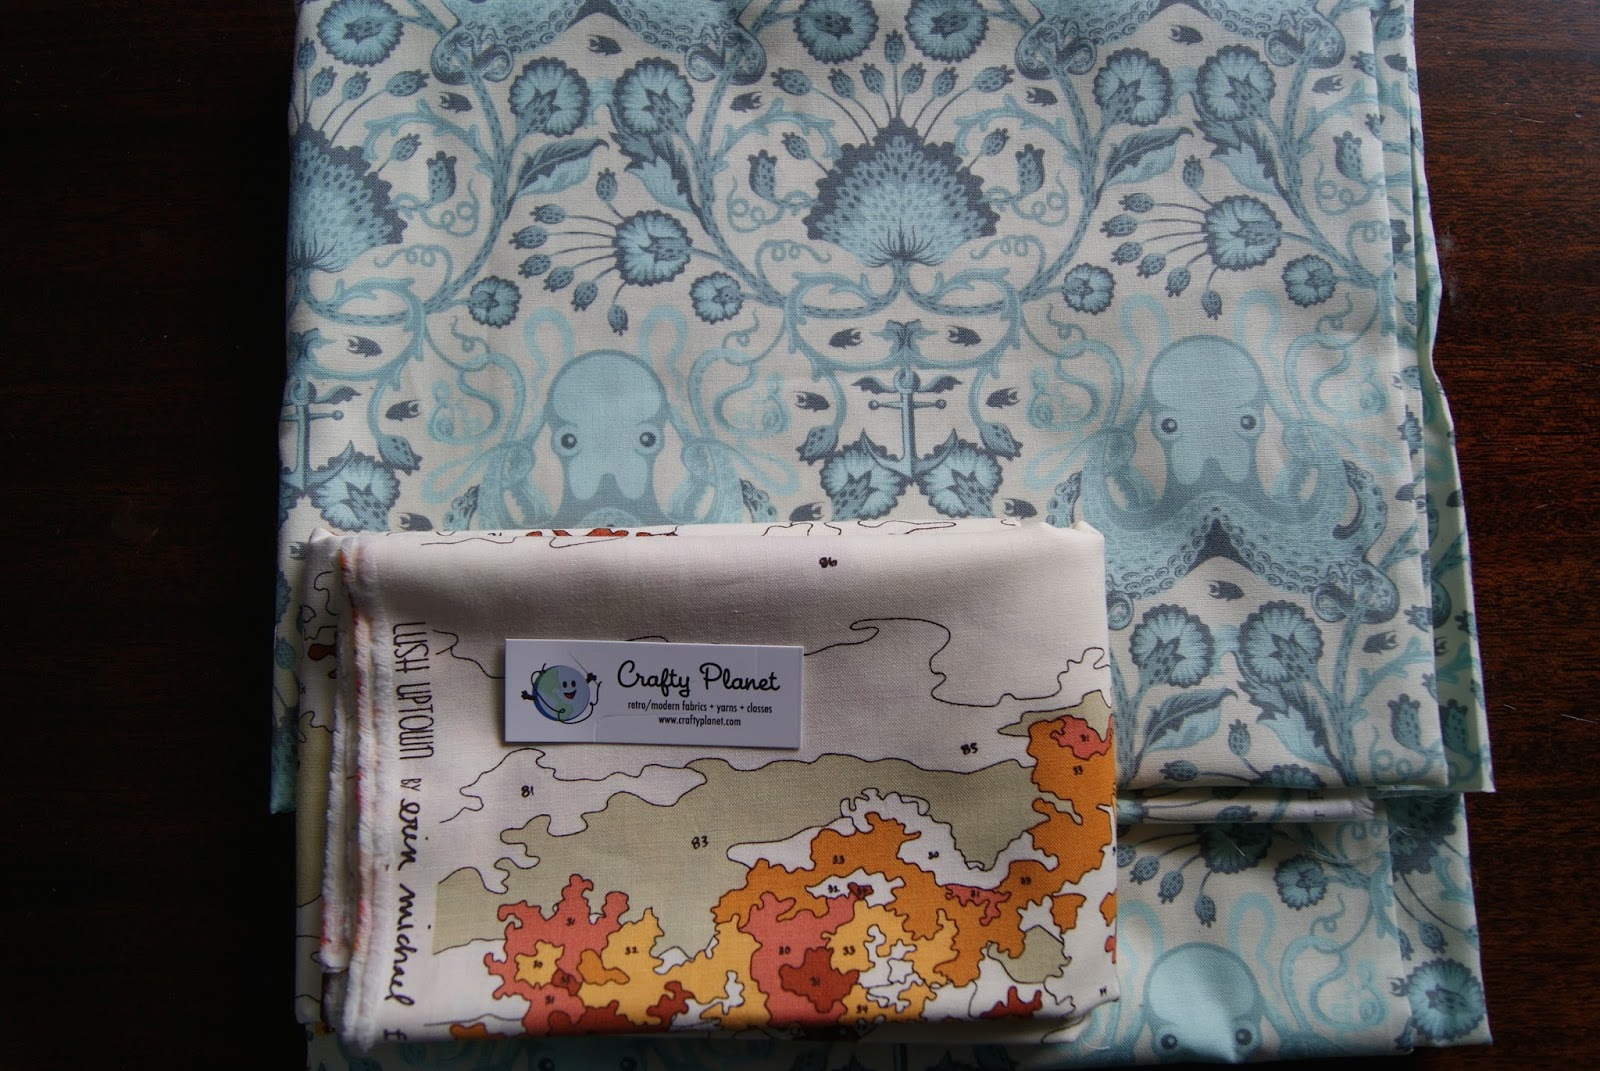 Fabric bought at Crafty Planet, Minneapolis, Minnesota